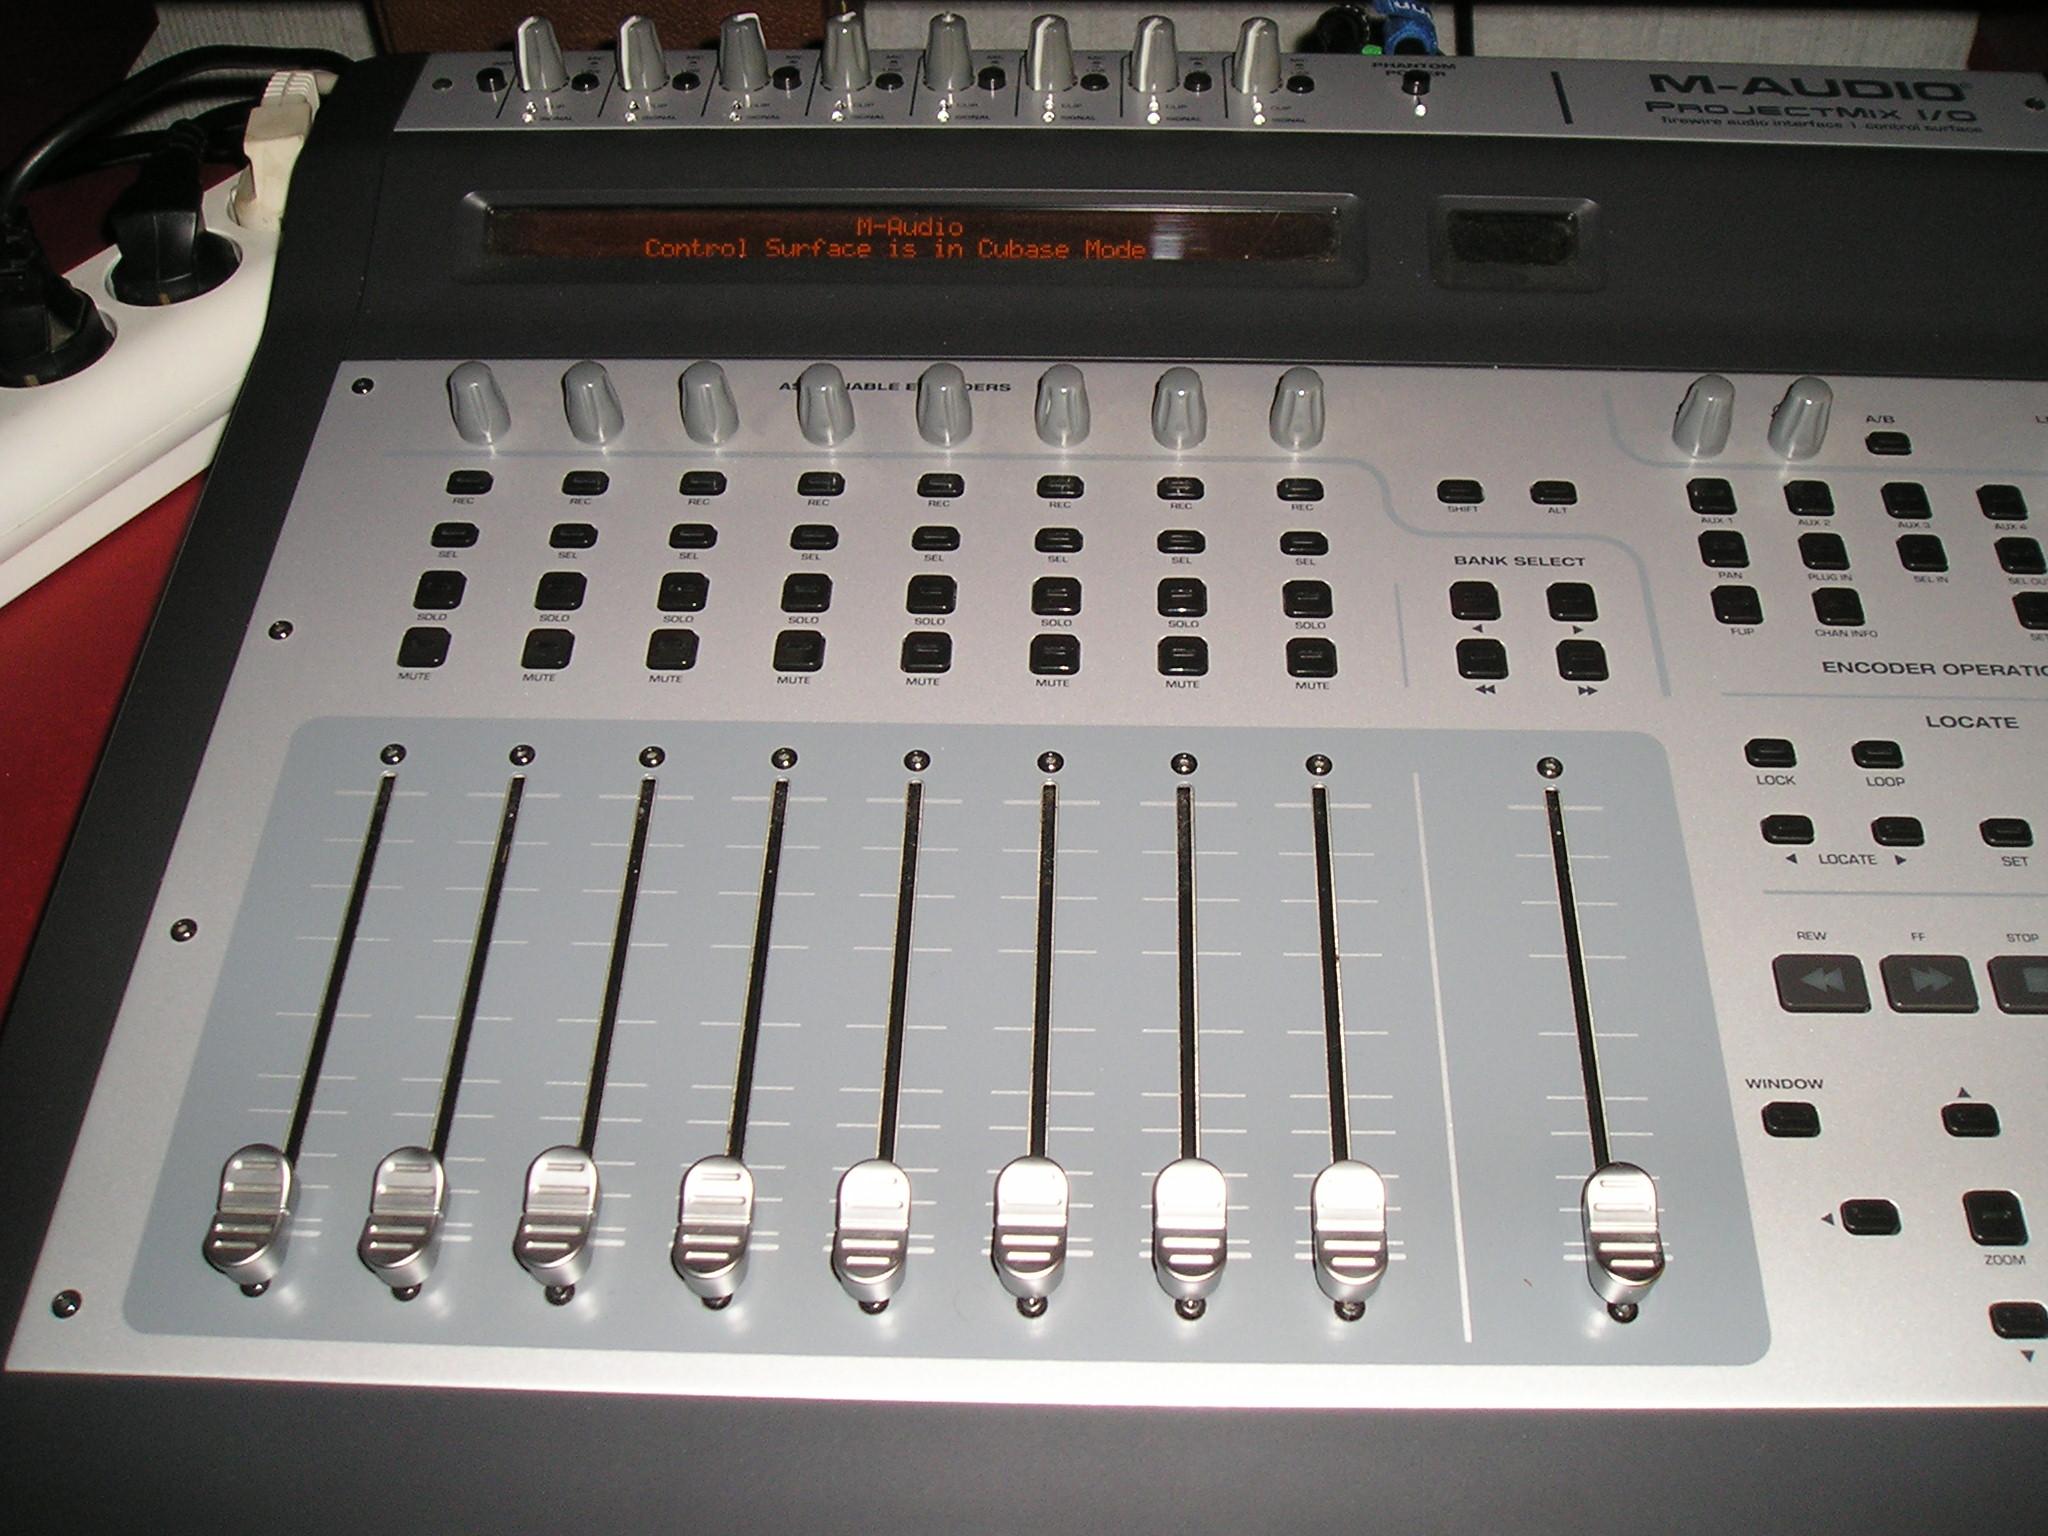 M-Audio ProjectMix I/O User Manual